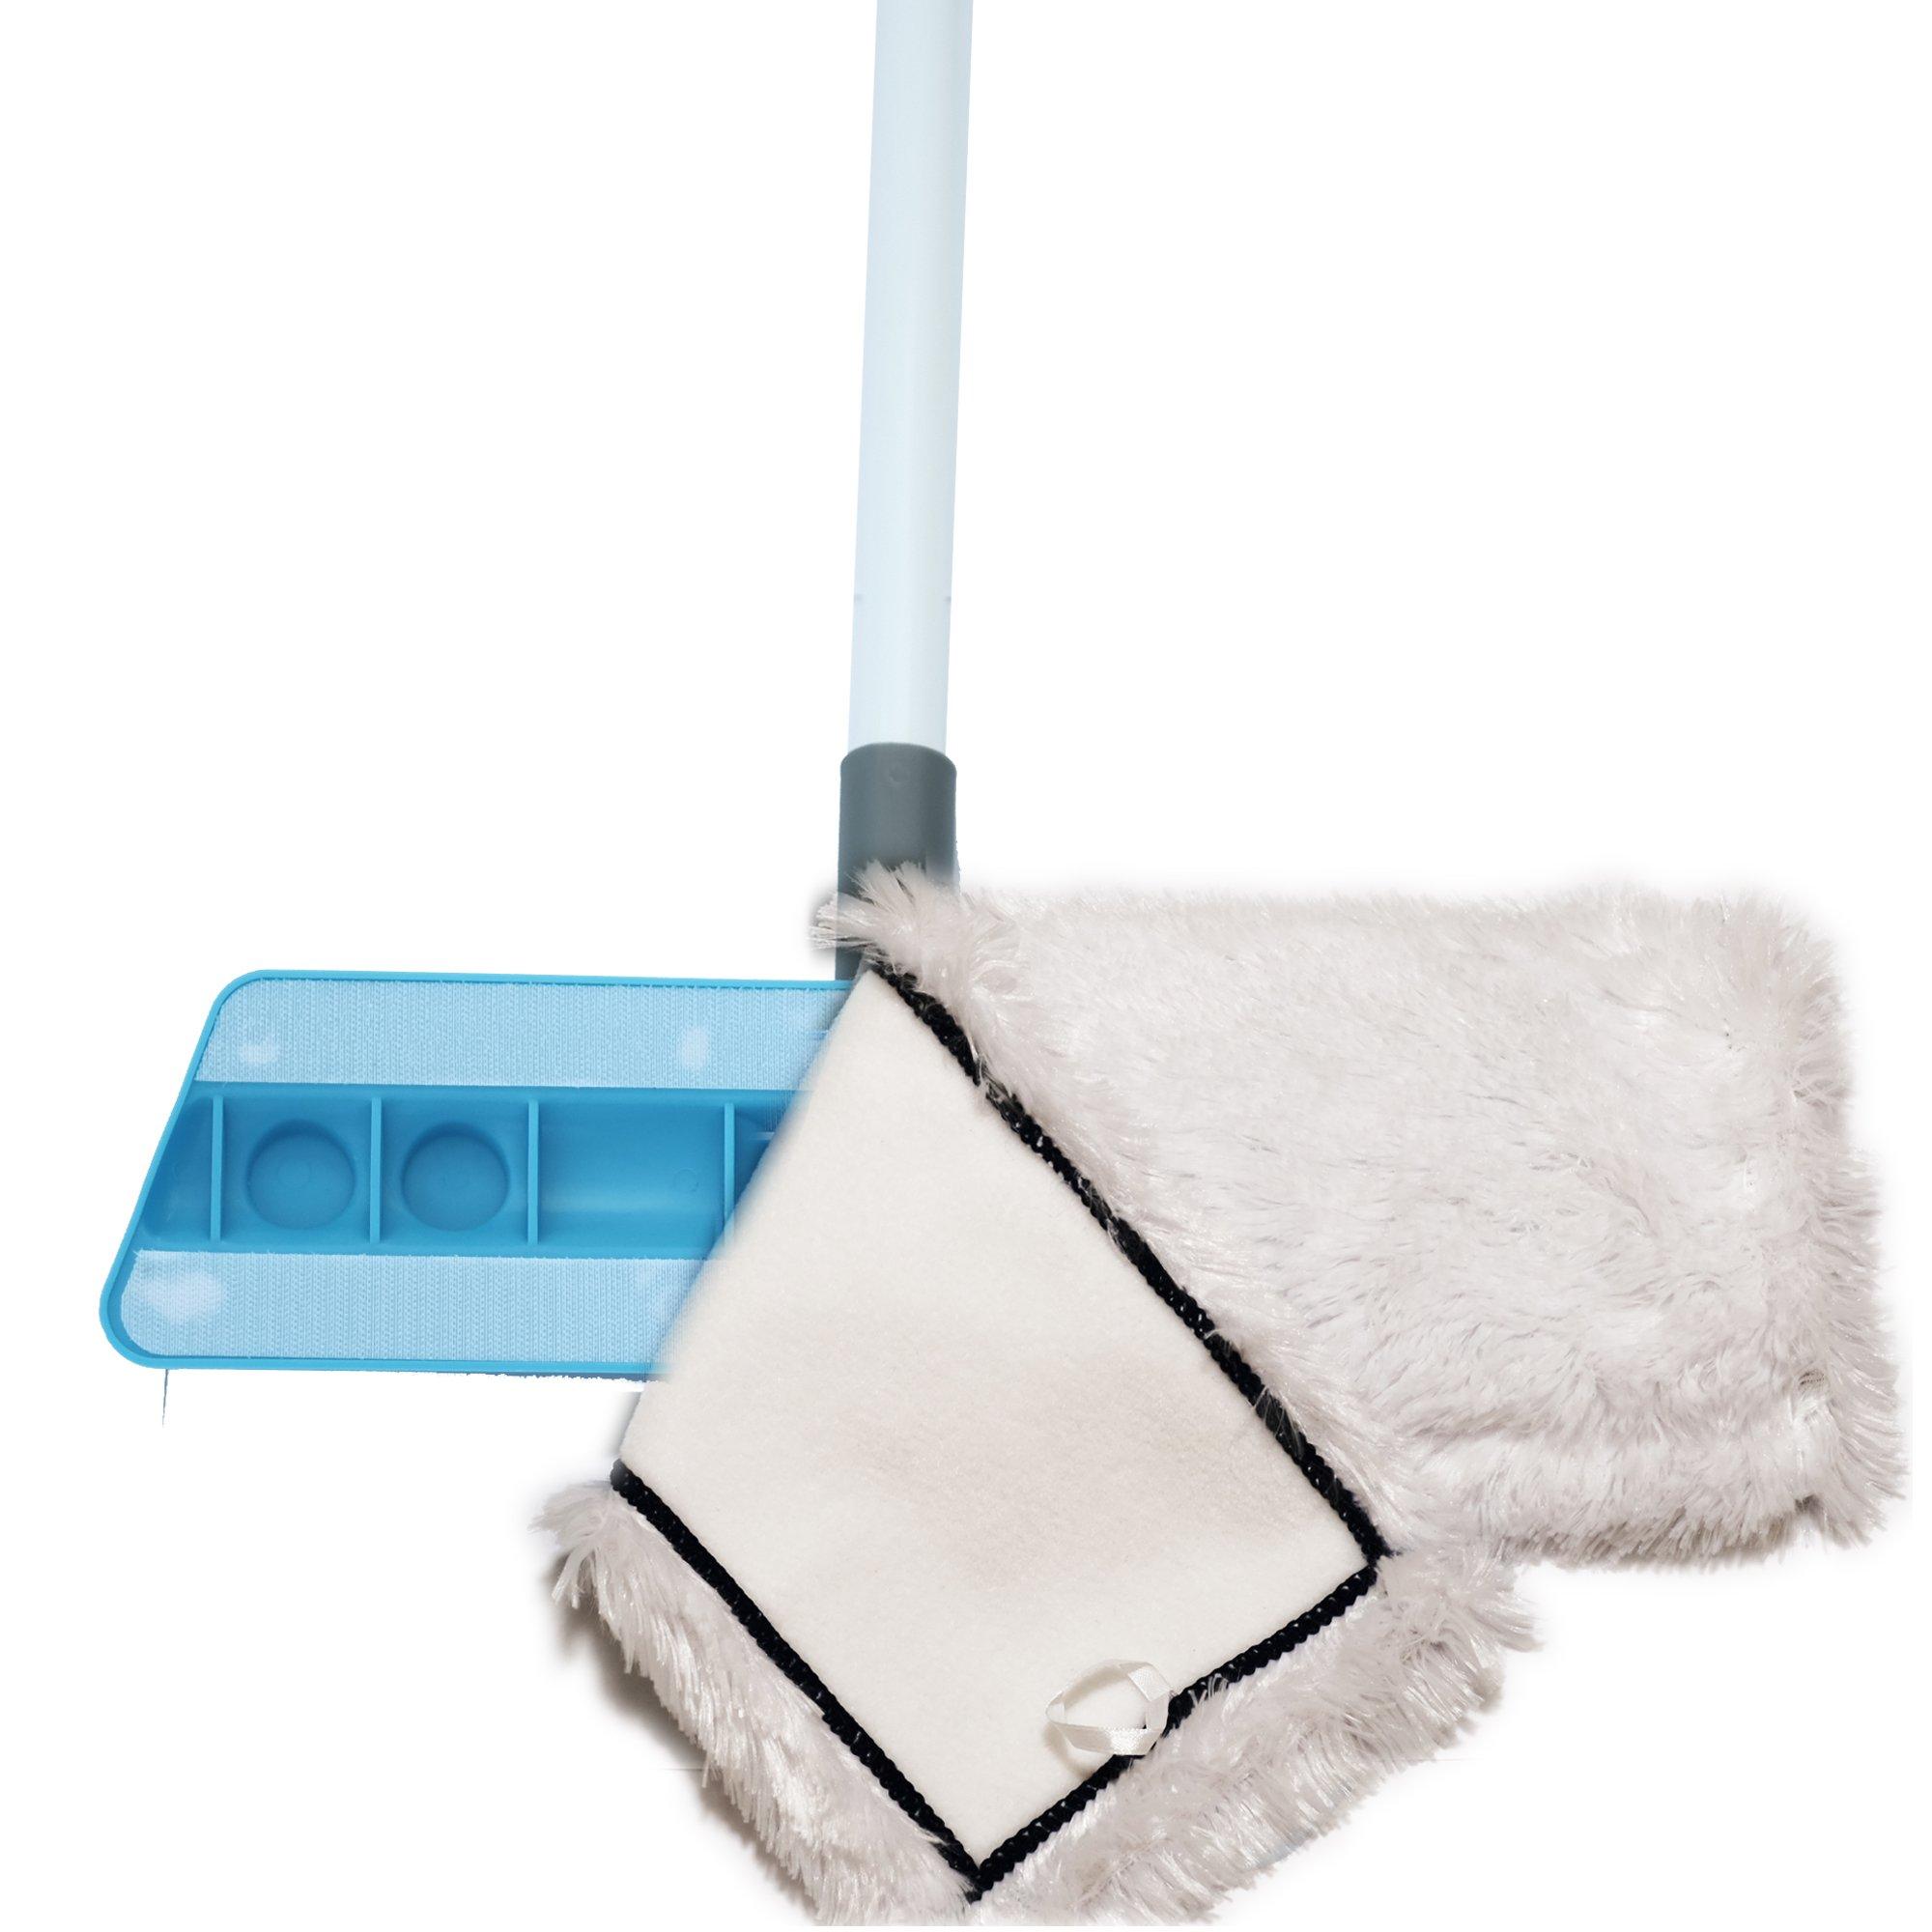 Microfiber Mop 18inch Velcro Wet & Dry Mop Refill for Hardwood Floors Set of 8 by Bear Family by Bear Family Microfiber (Image #6)